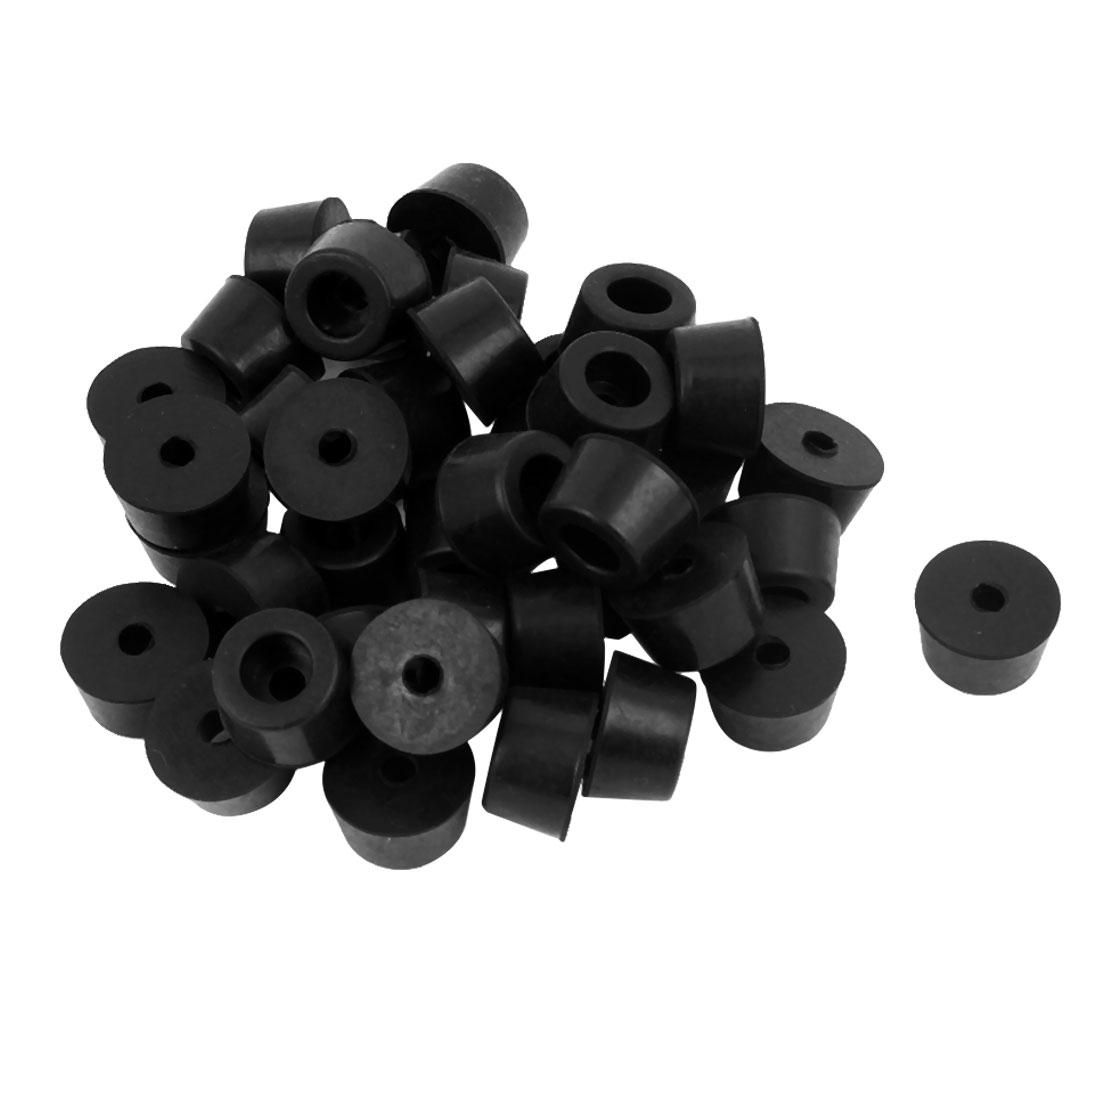 40 Pcs 17mm x 10mm Conical Rubber Furniture Bumper Foot Cover Pad Black